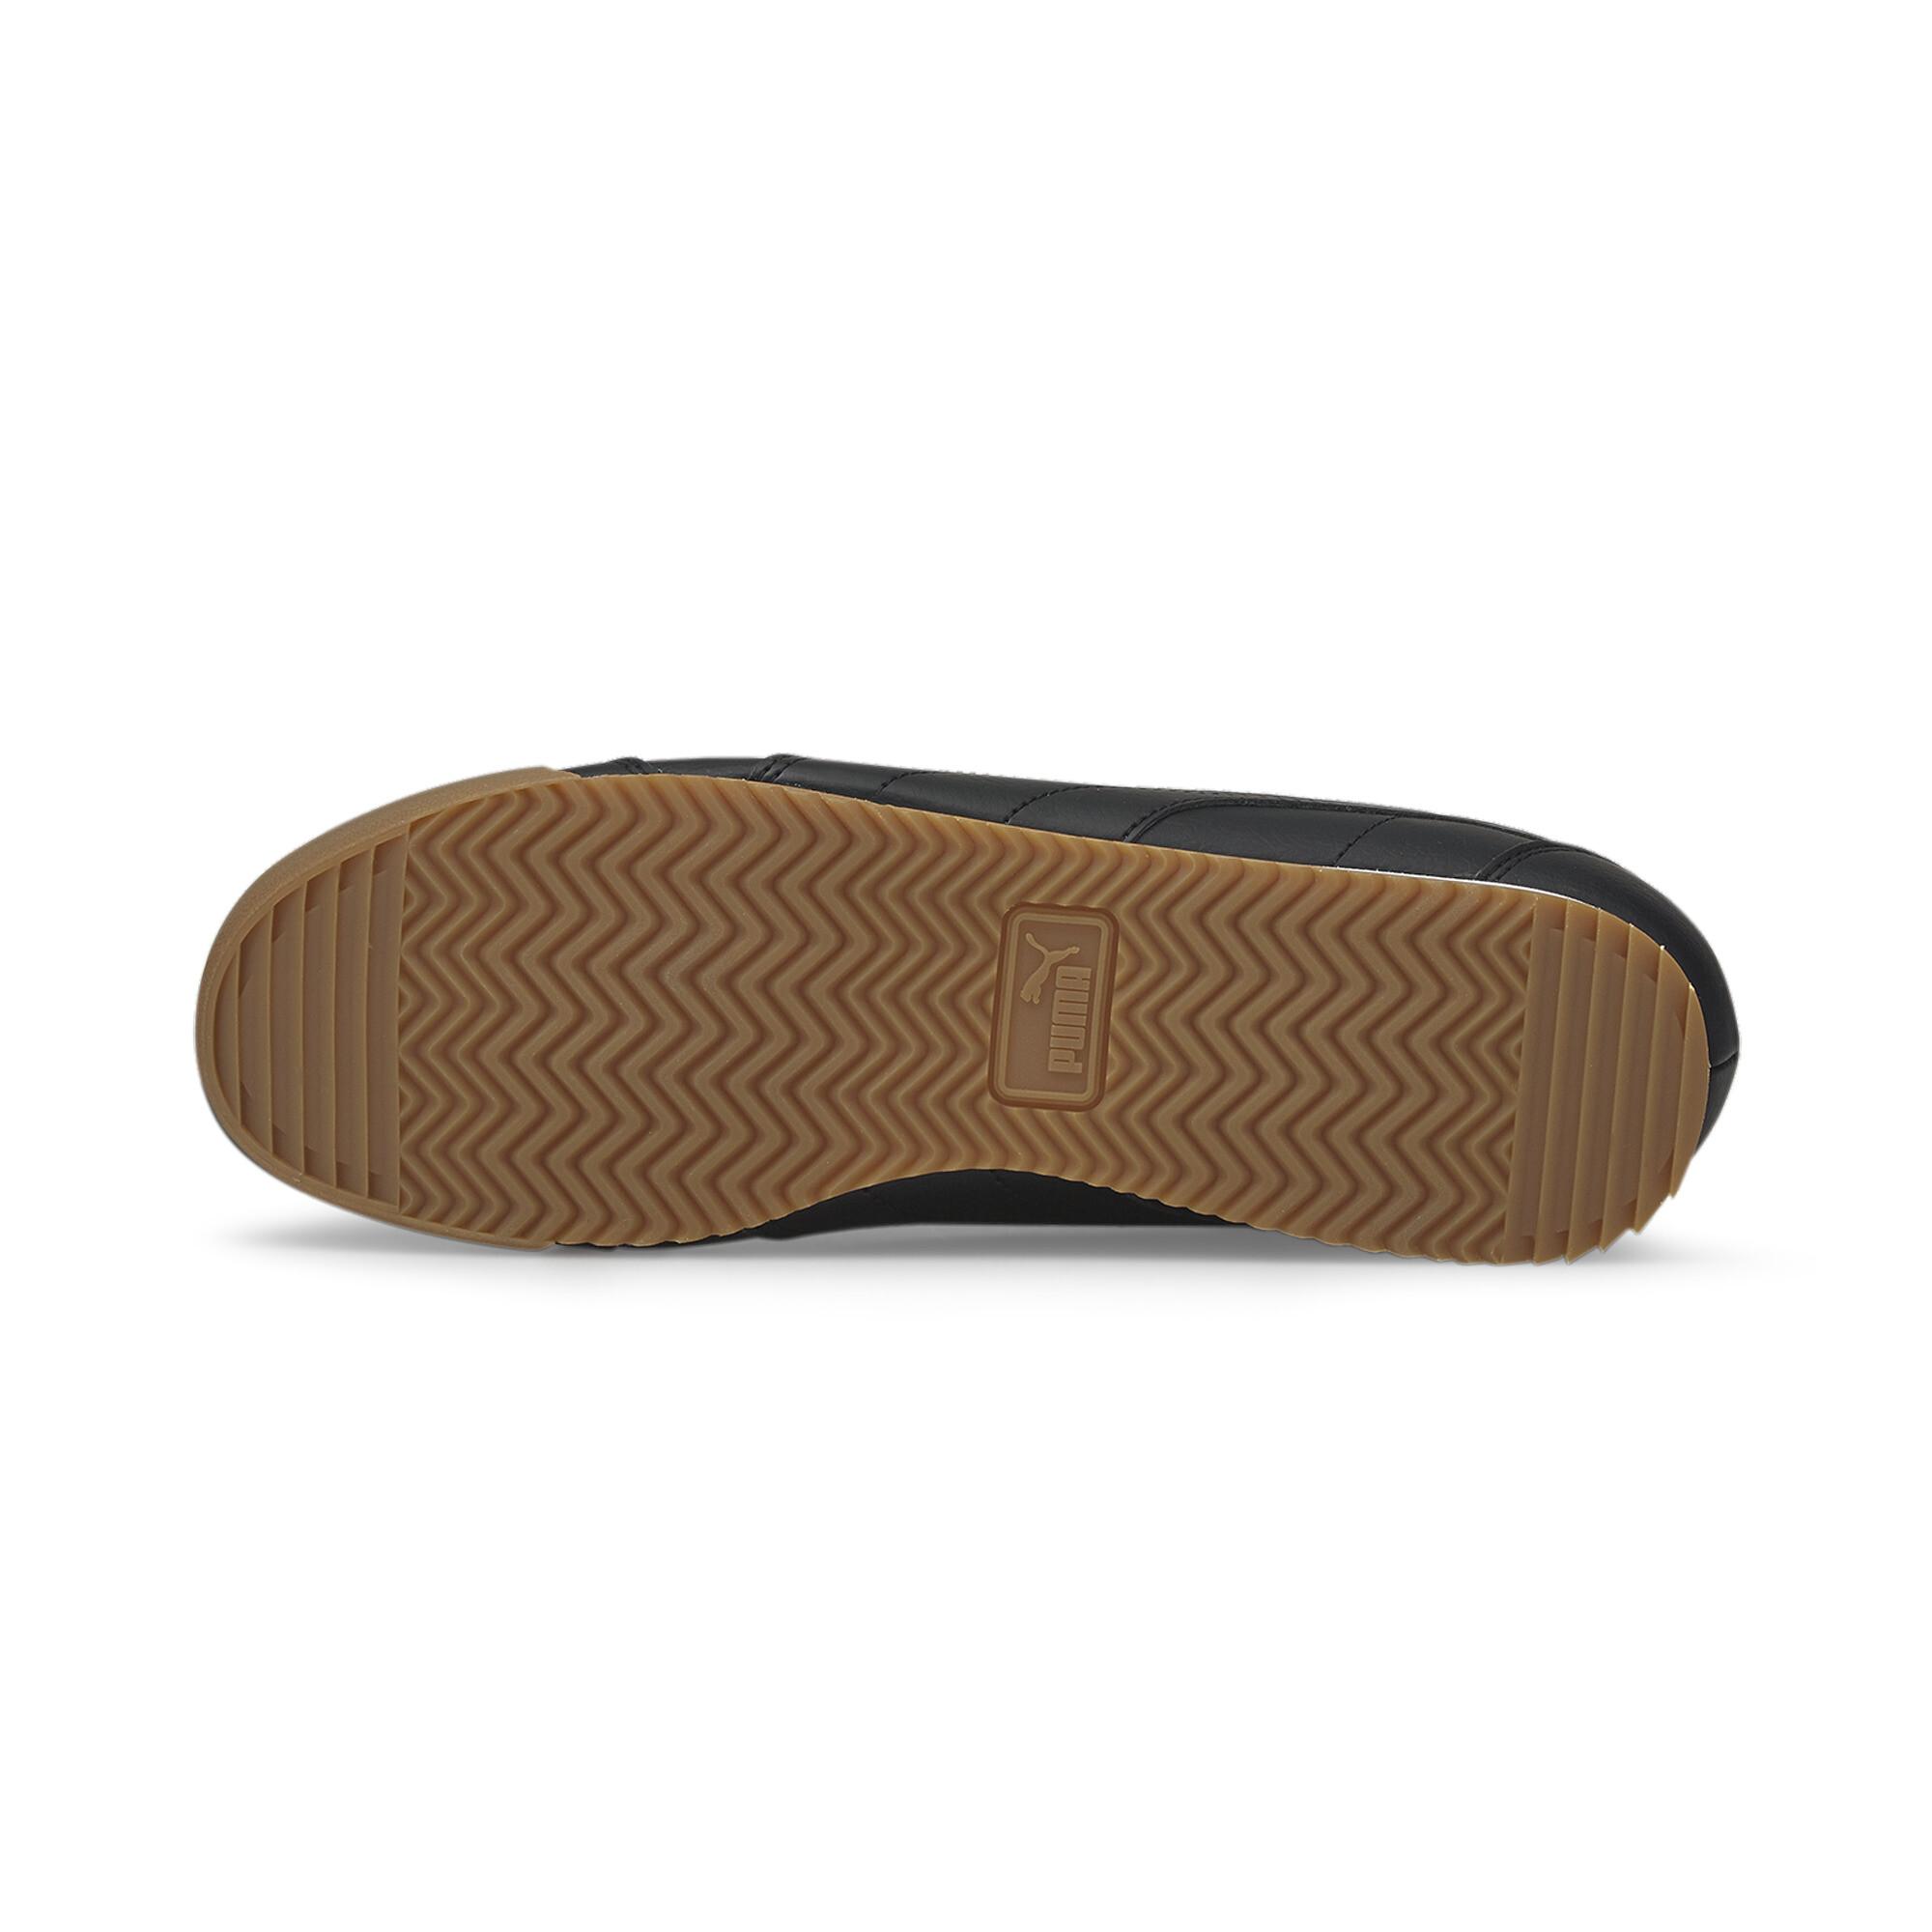 thumbnail 8 - PUMA Men's Turino SL Sneakers